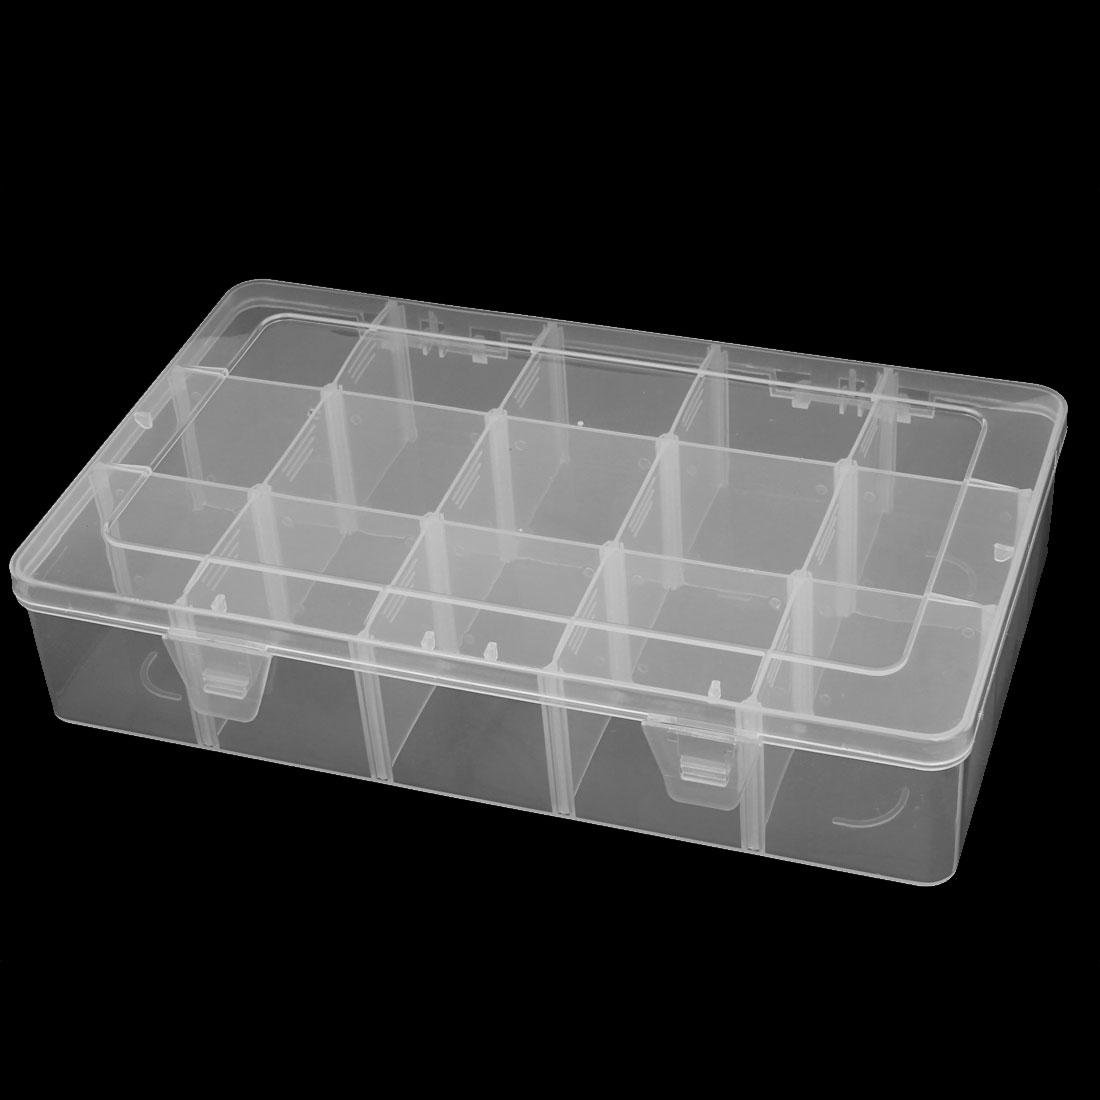 Unique Bargains Transparent Plastic 15 Compartments in 1 Electronic Component Storage Box Case Container